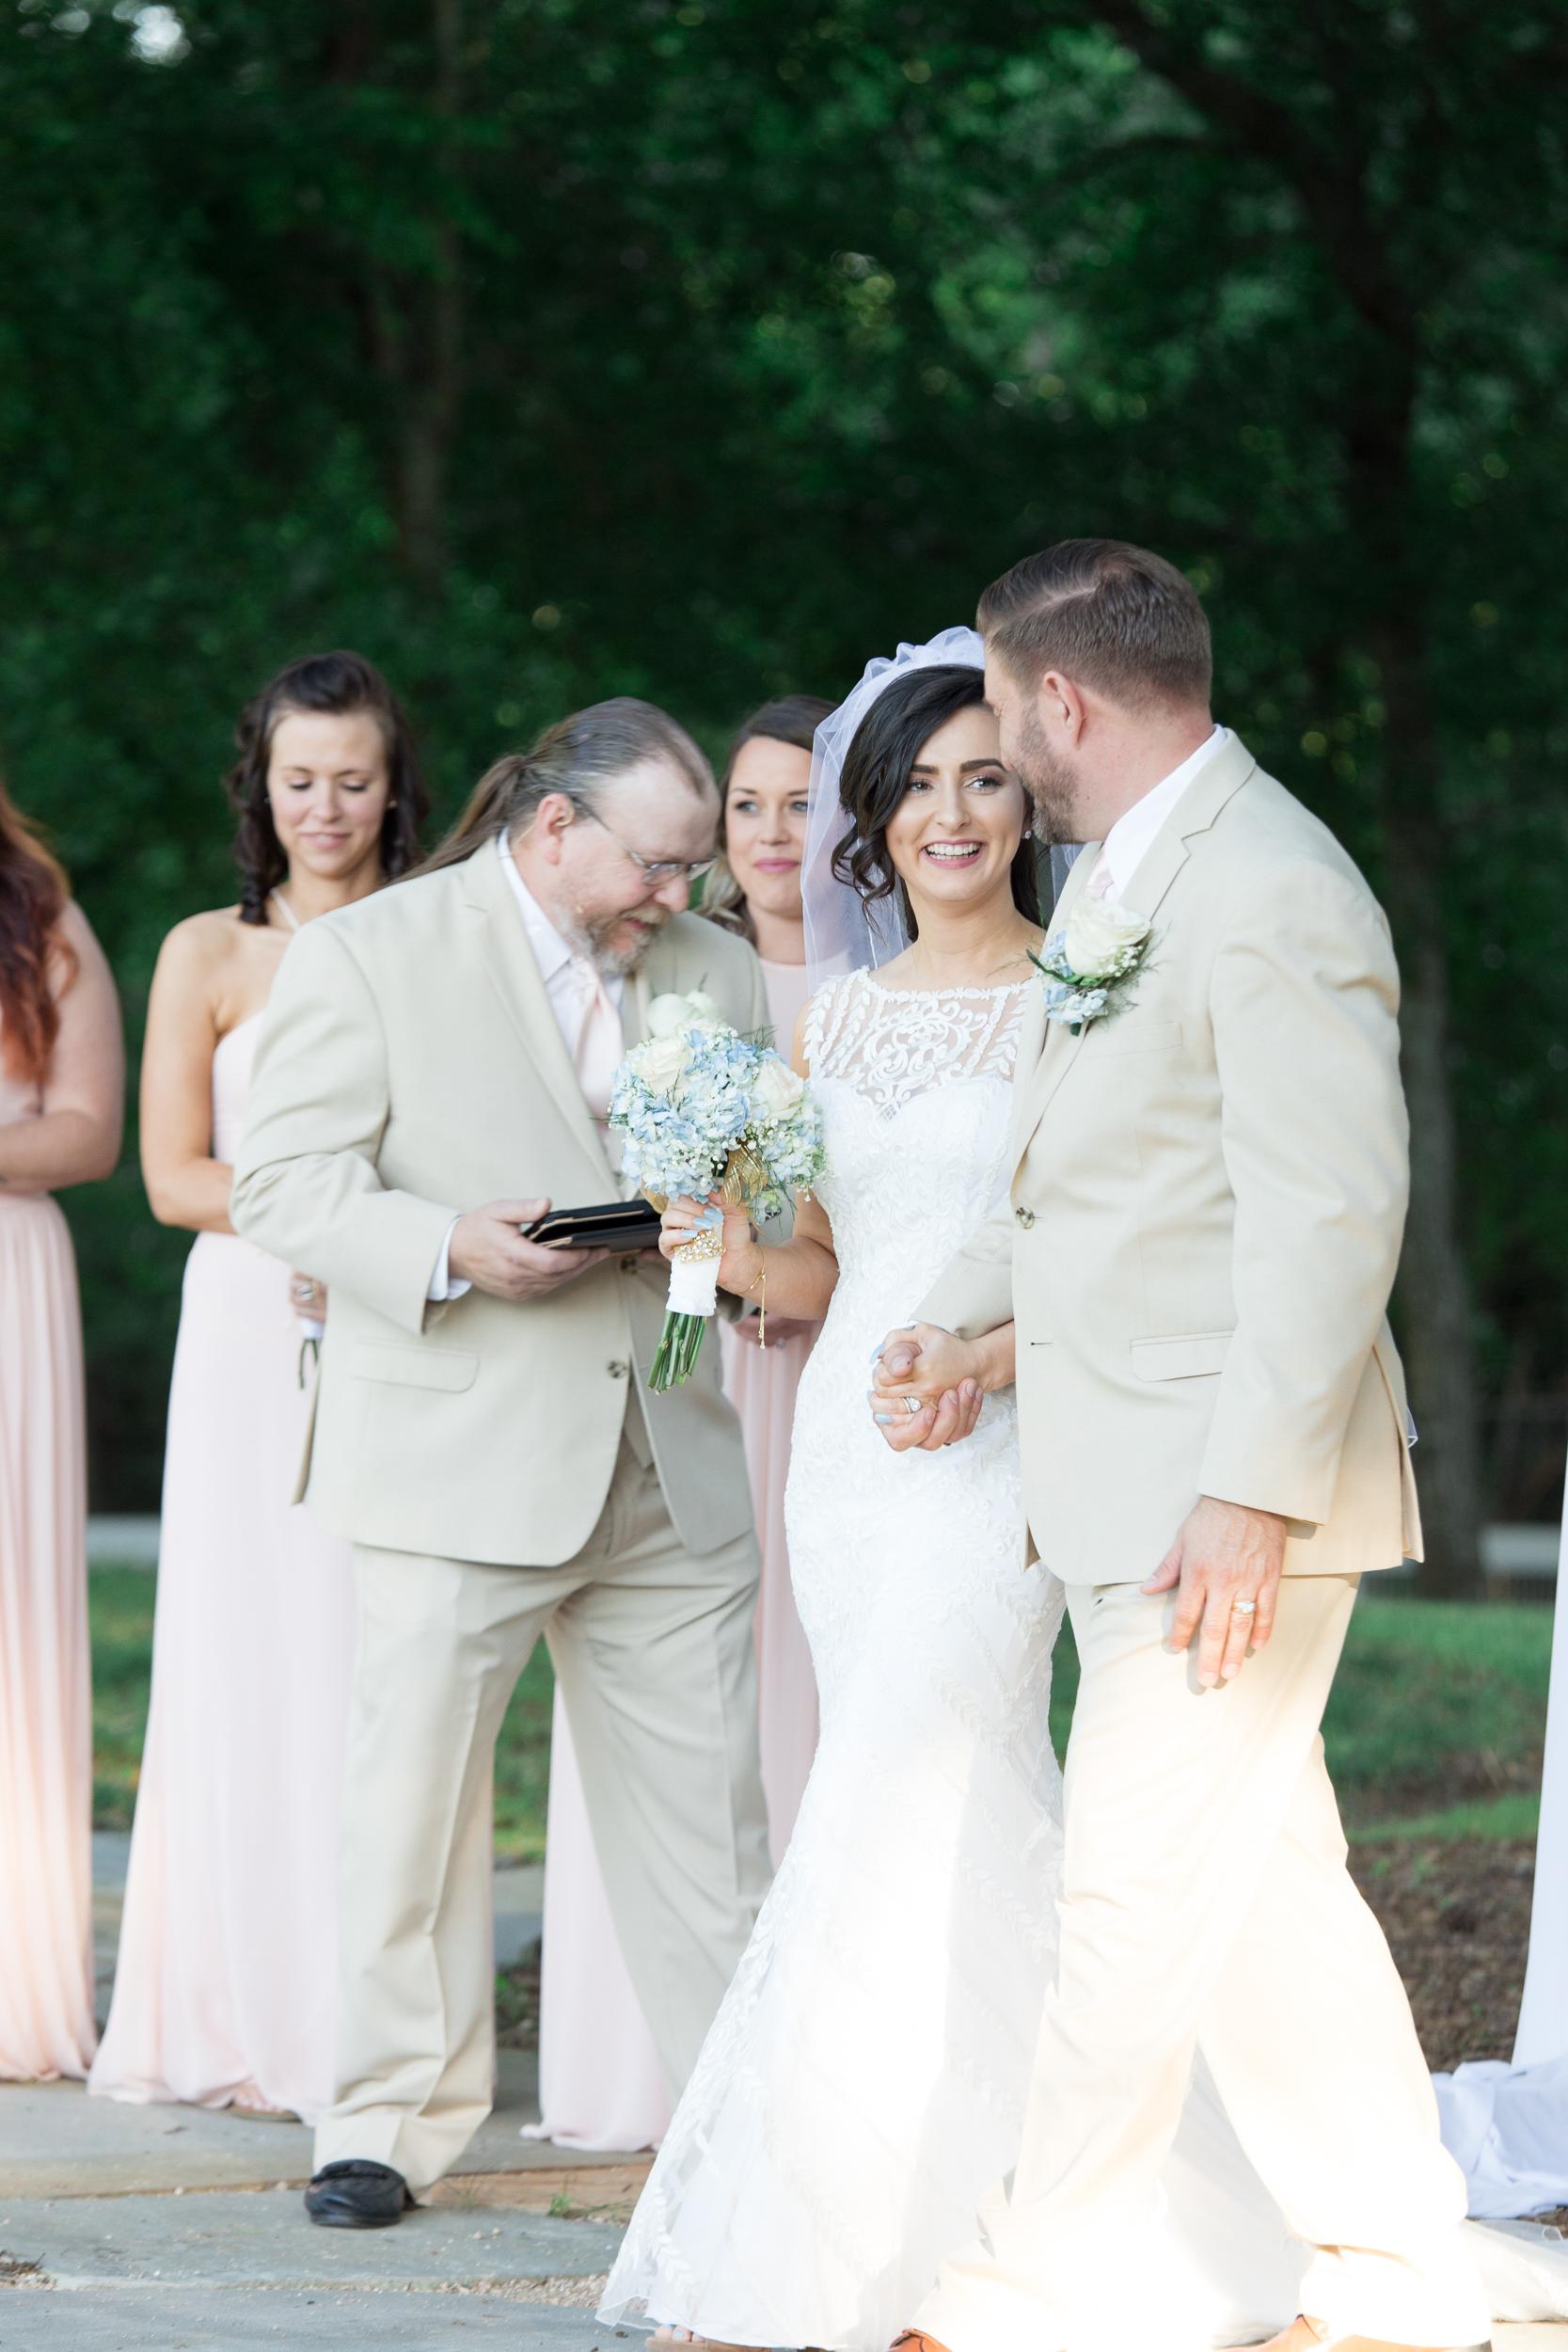 Zihlman-East TX Wedding_Kelsie Hendricks Photography_The Folmar Tyler Texas-34.jpg